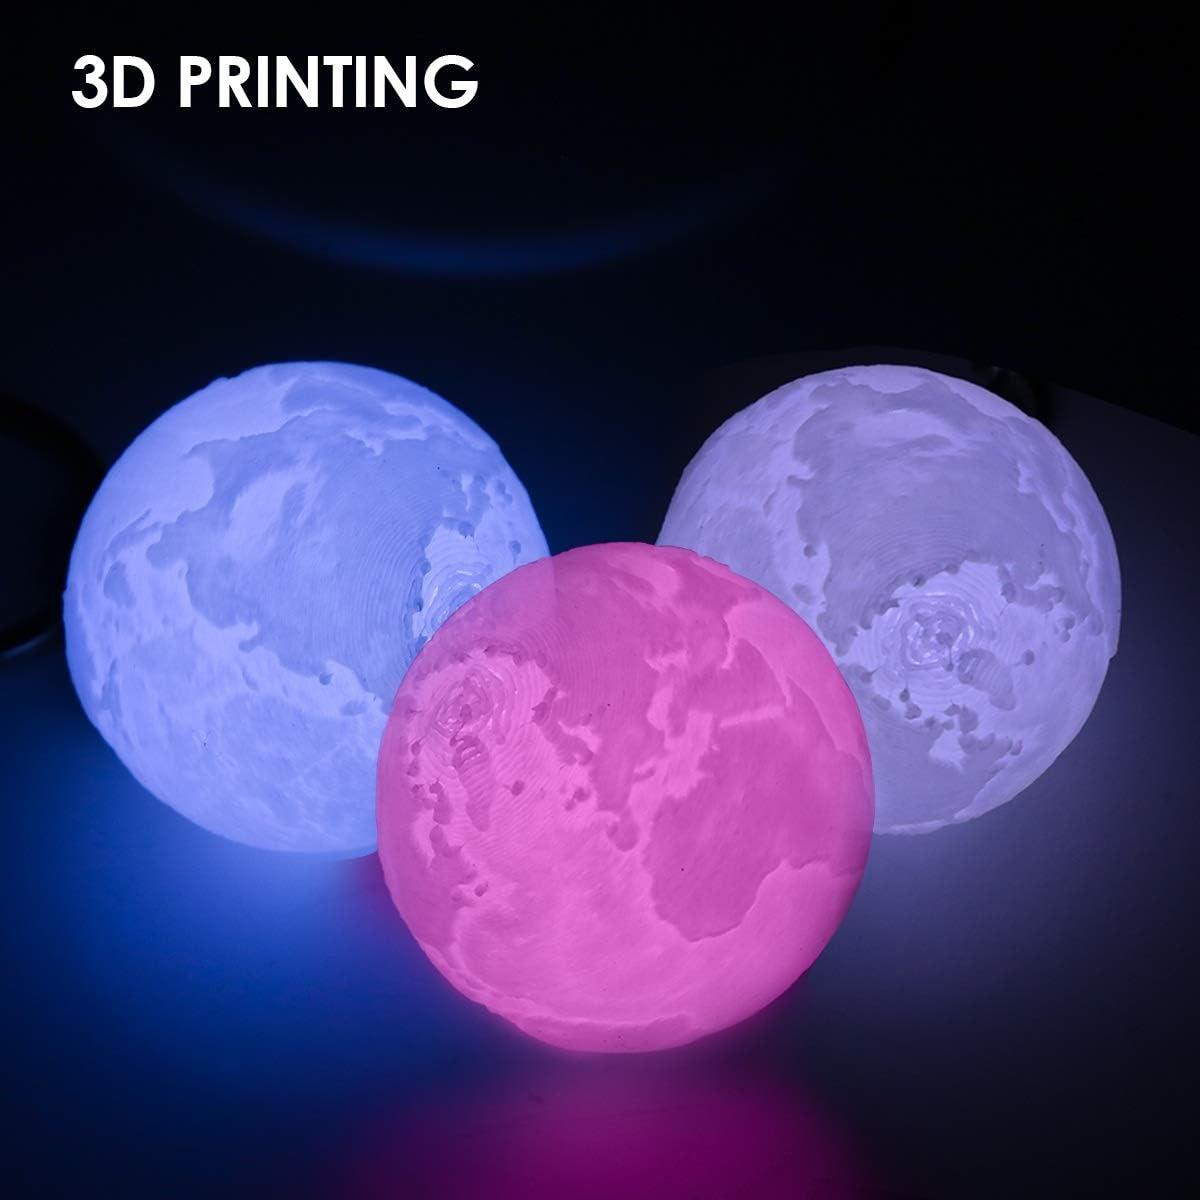 Colorful 3D Printing Keychain Lamp Key Chain Pendant Light Battery Powered Key Holder Bag Decoration Pendant Color : Earth+Jupiter